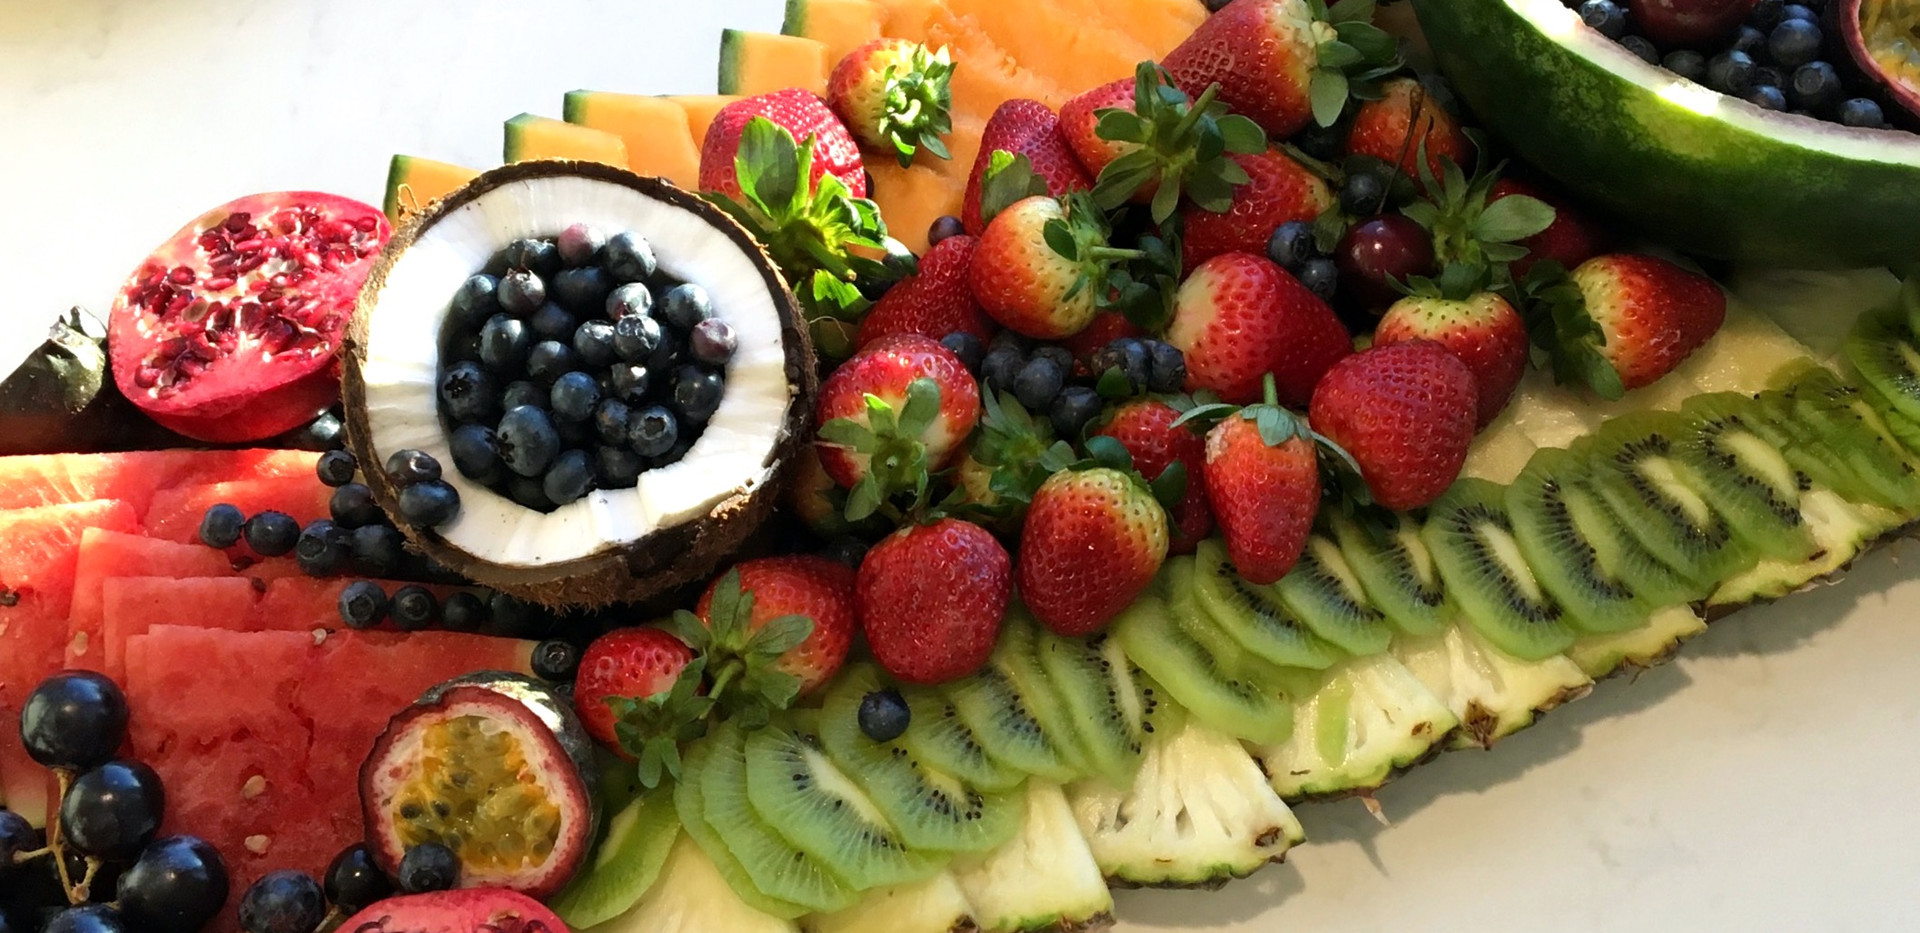 Large Fruit Platter